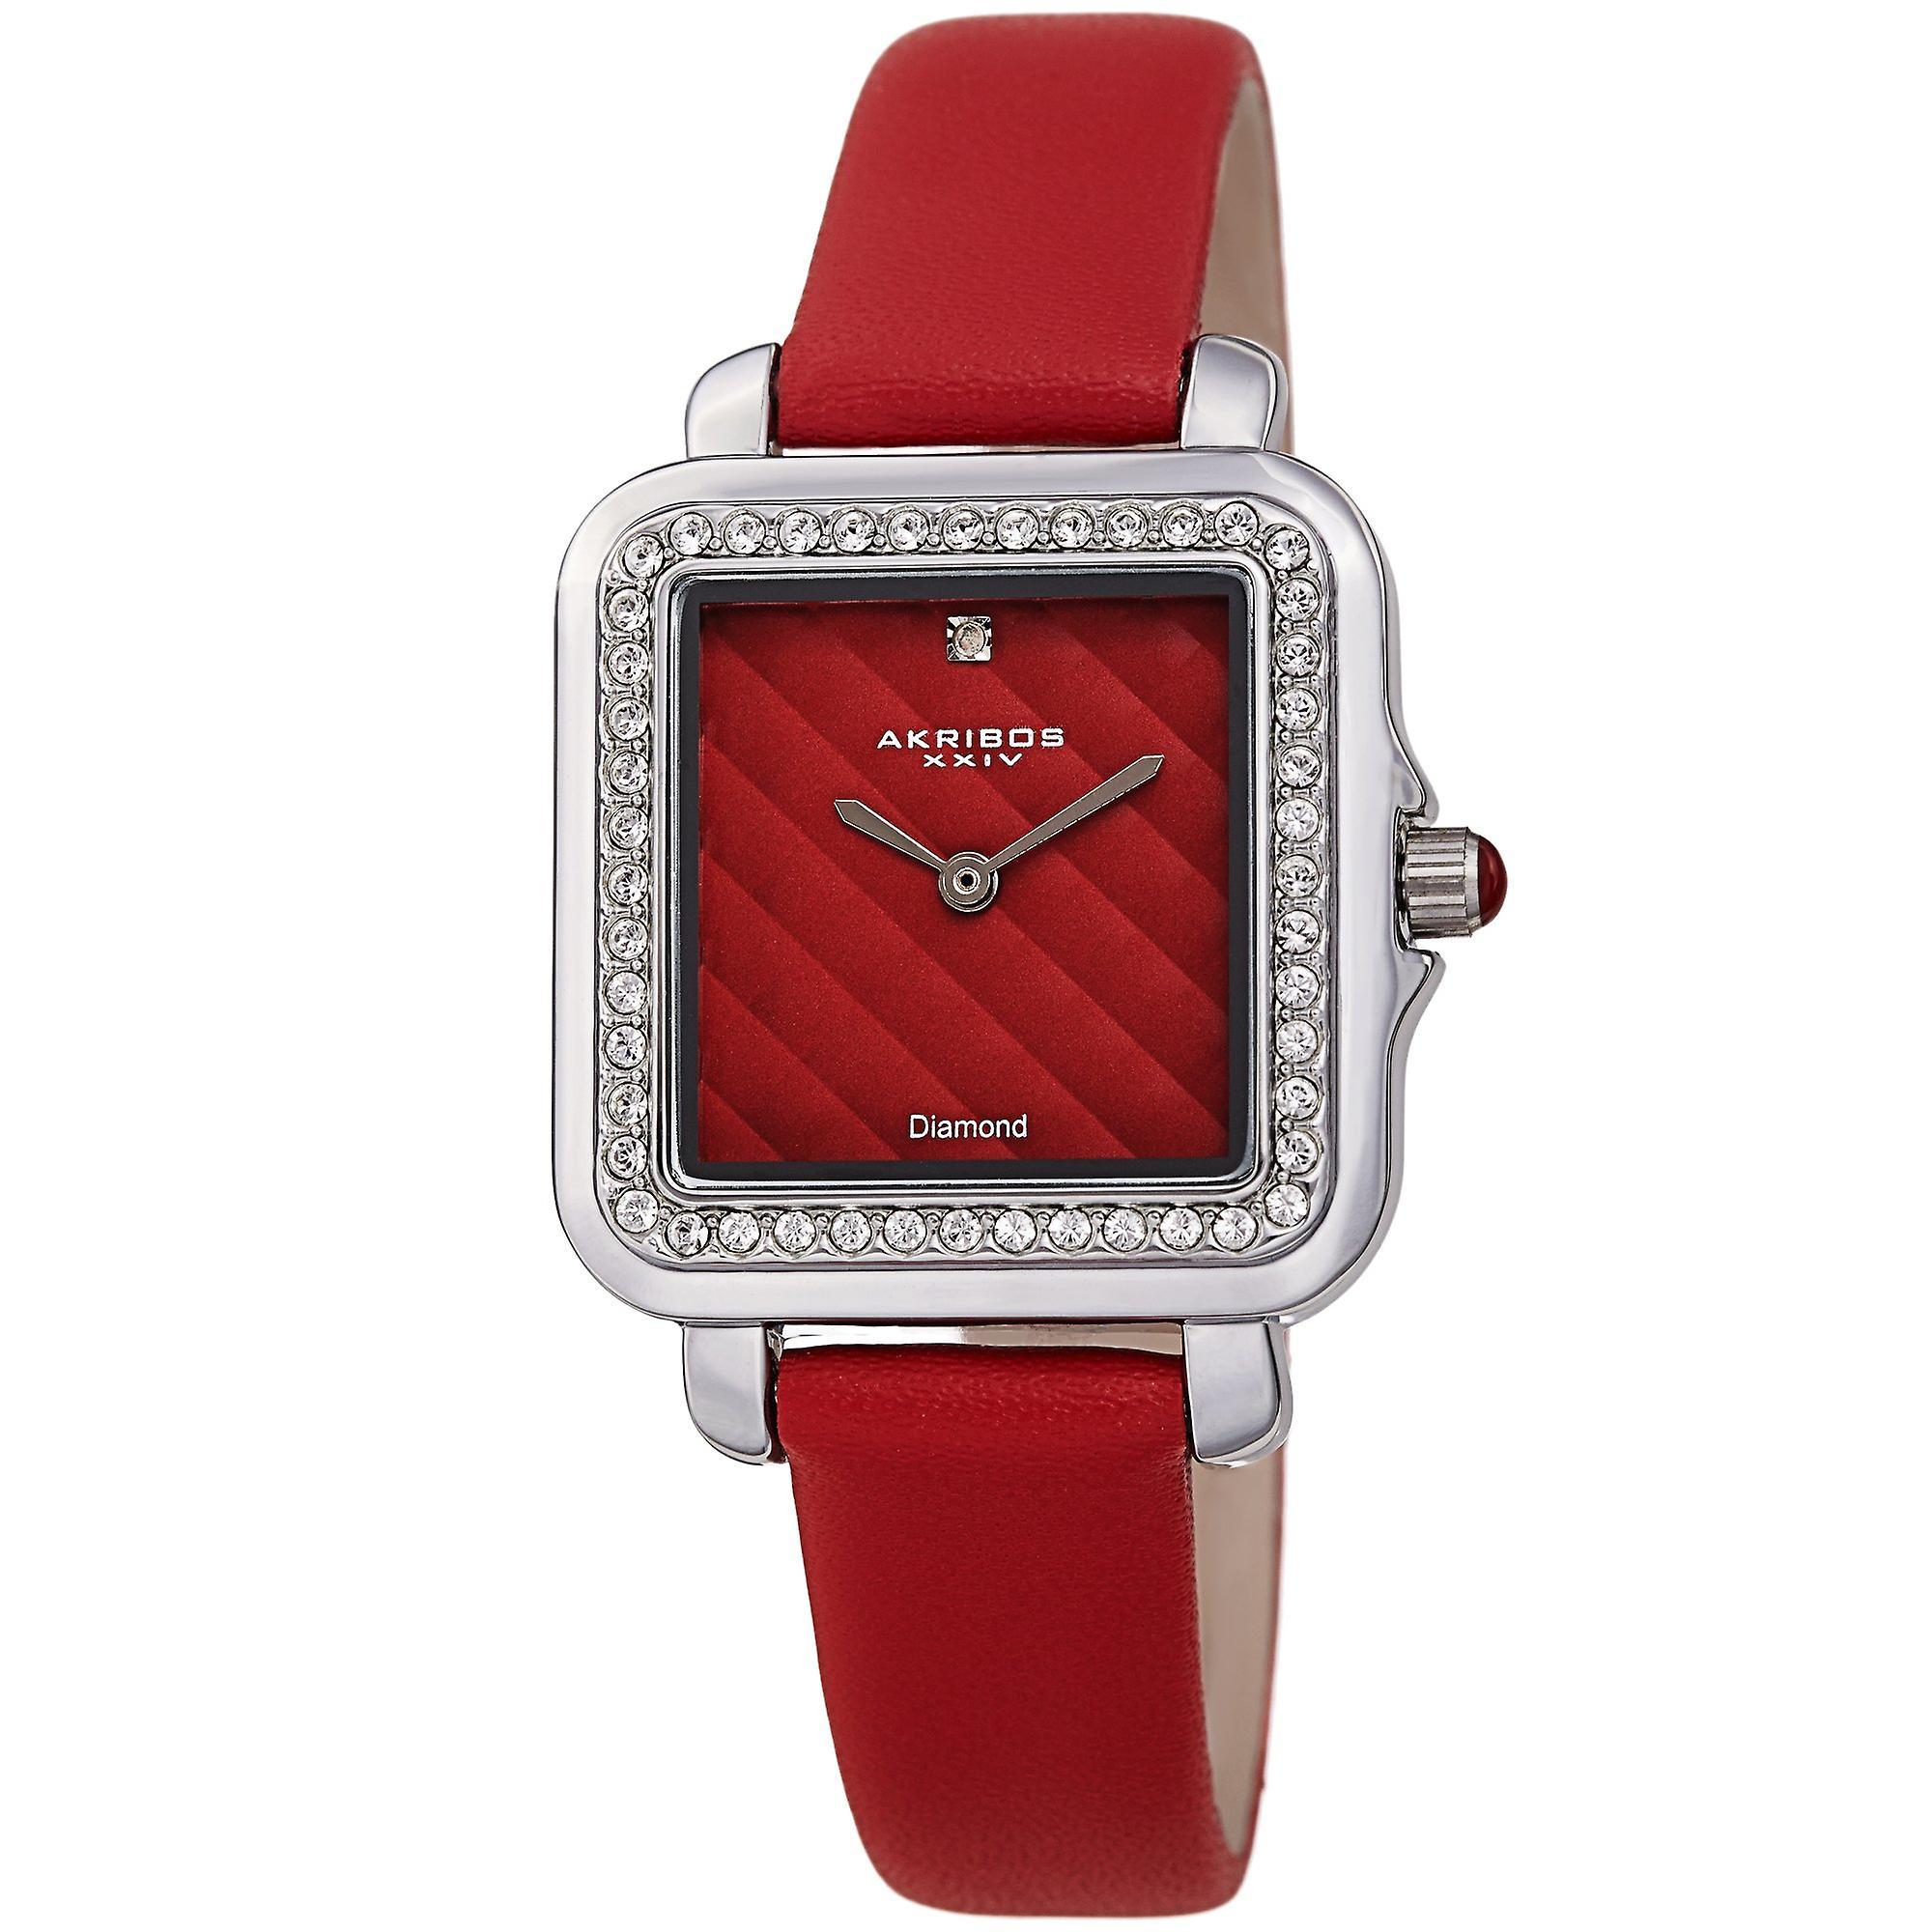 Akribos XXIV AKS191106RD Women's Quartz Square Diamond and Crystals Argyle Leather Strap Watch